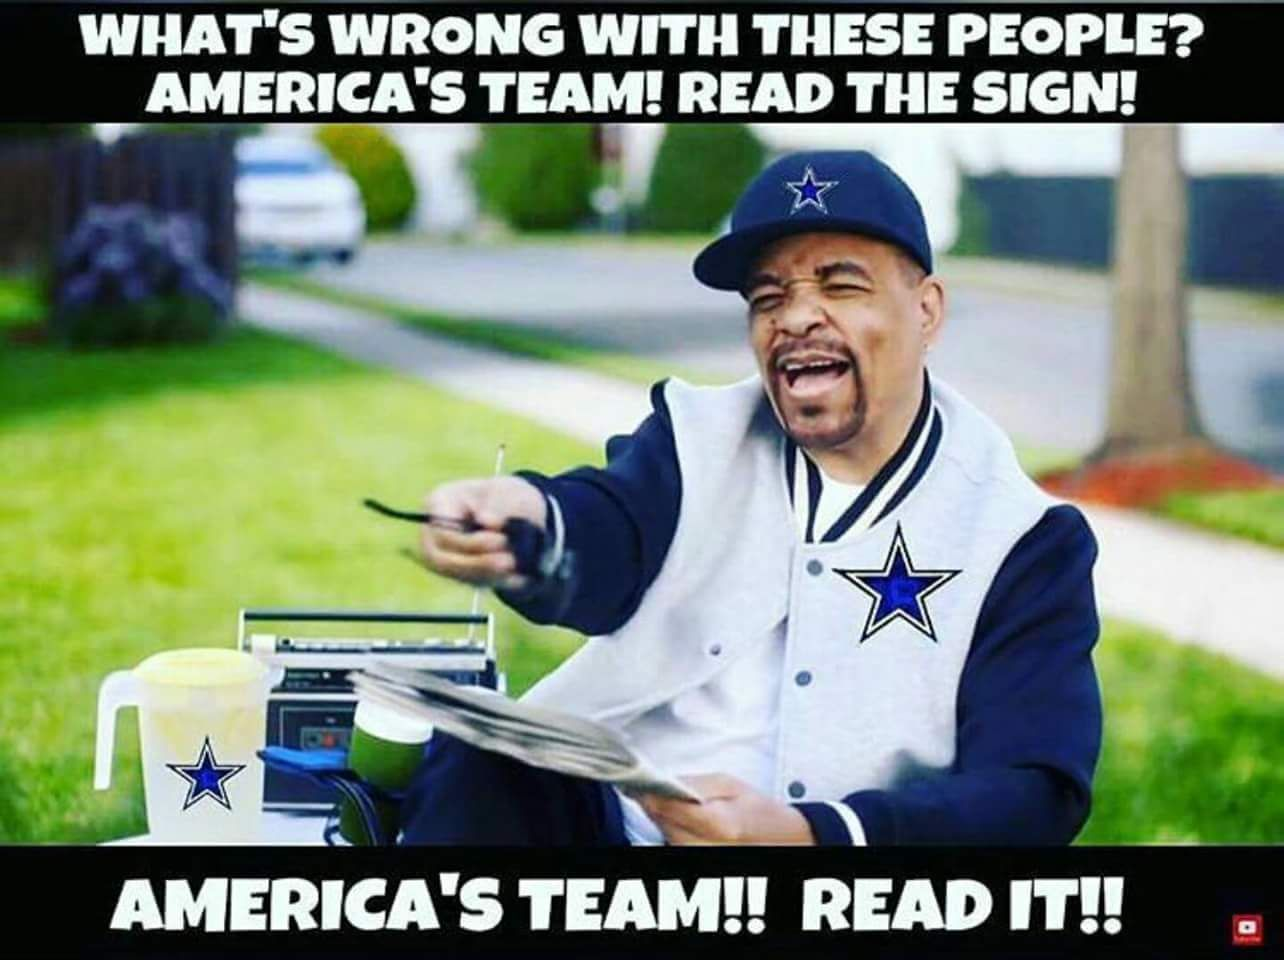 c48b4ed94740c89824a51a7a13883e0b spy whatsapp, facebook and calls! s www bibispy net,Cowboys Memes Facebook